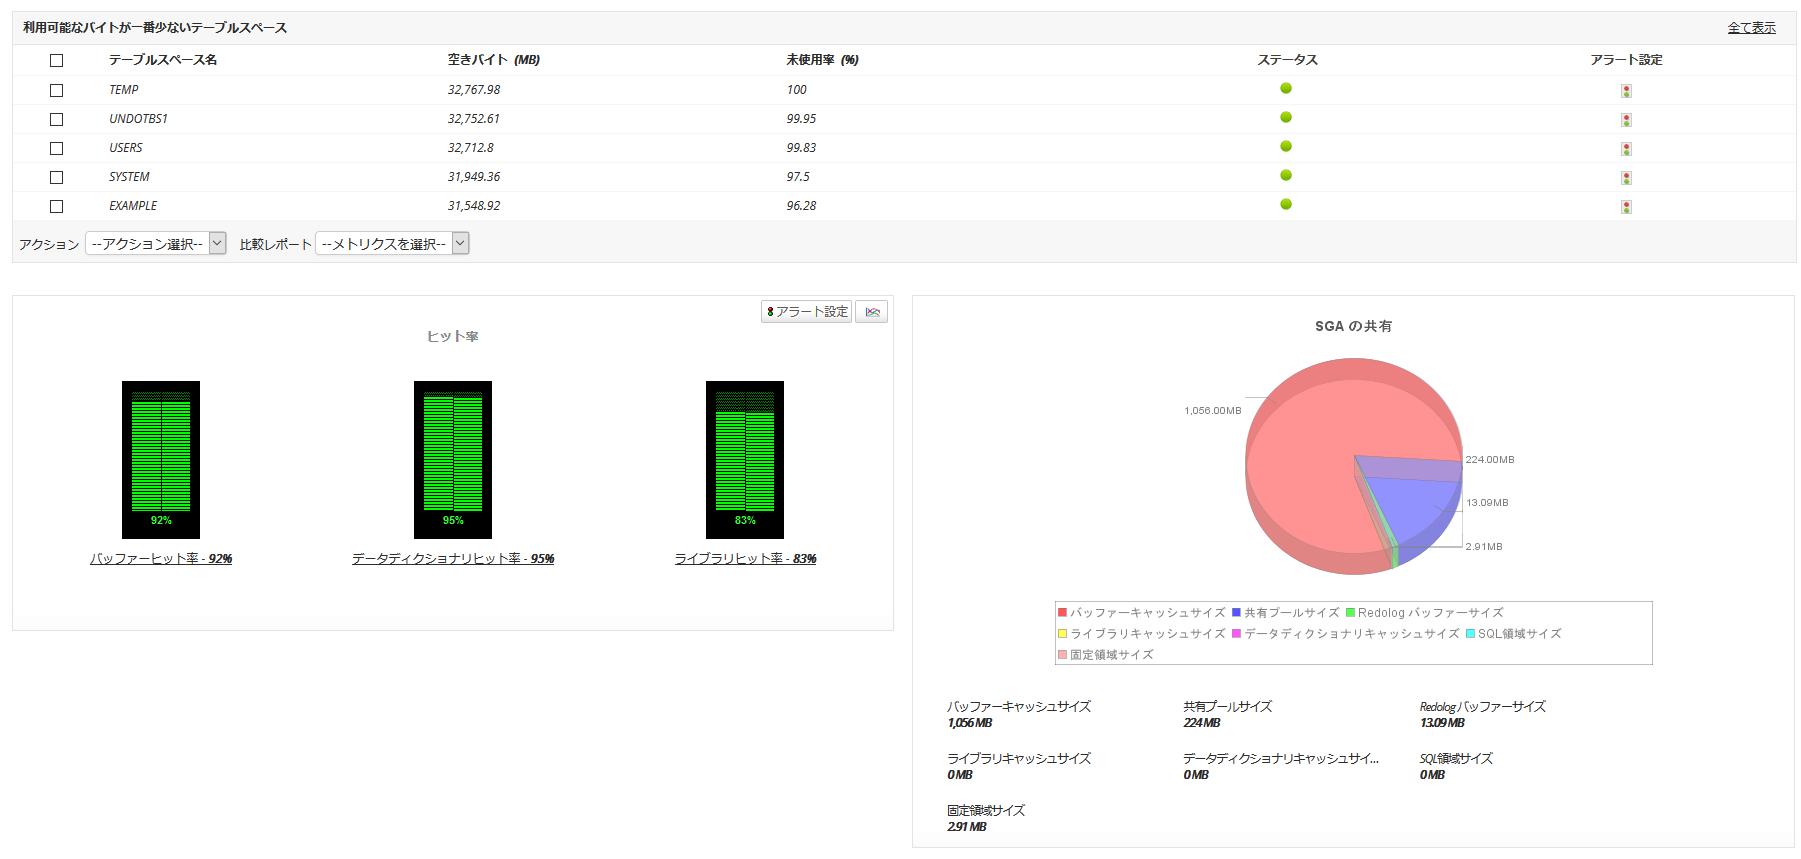 Oracle データベースサーバー 監視